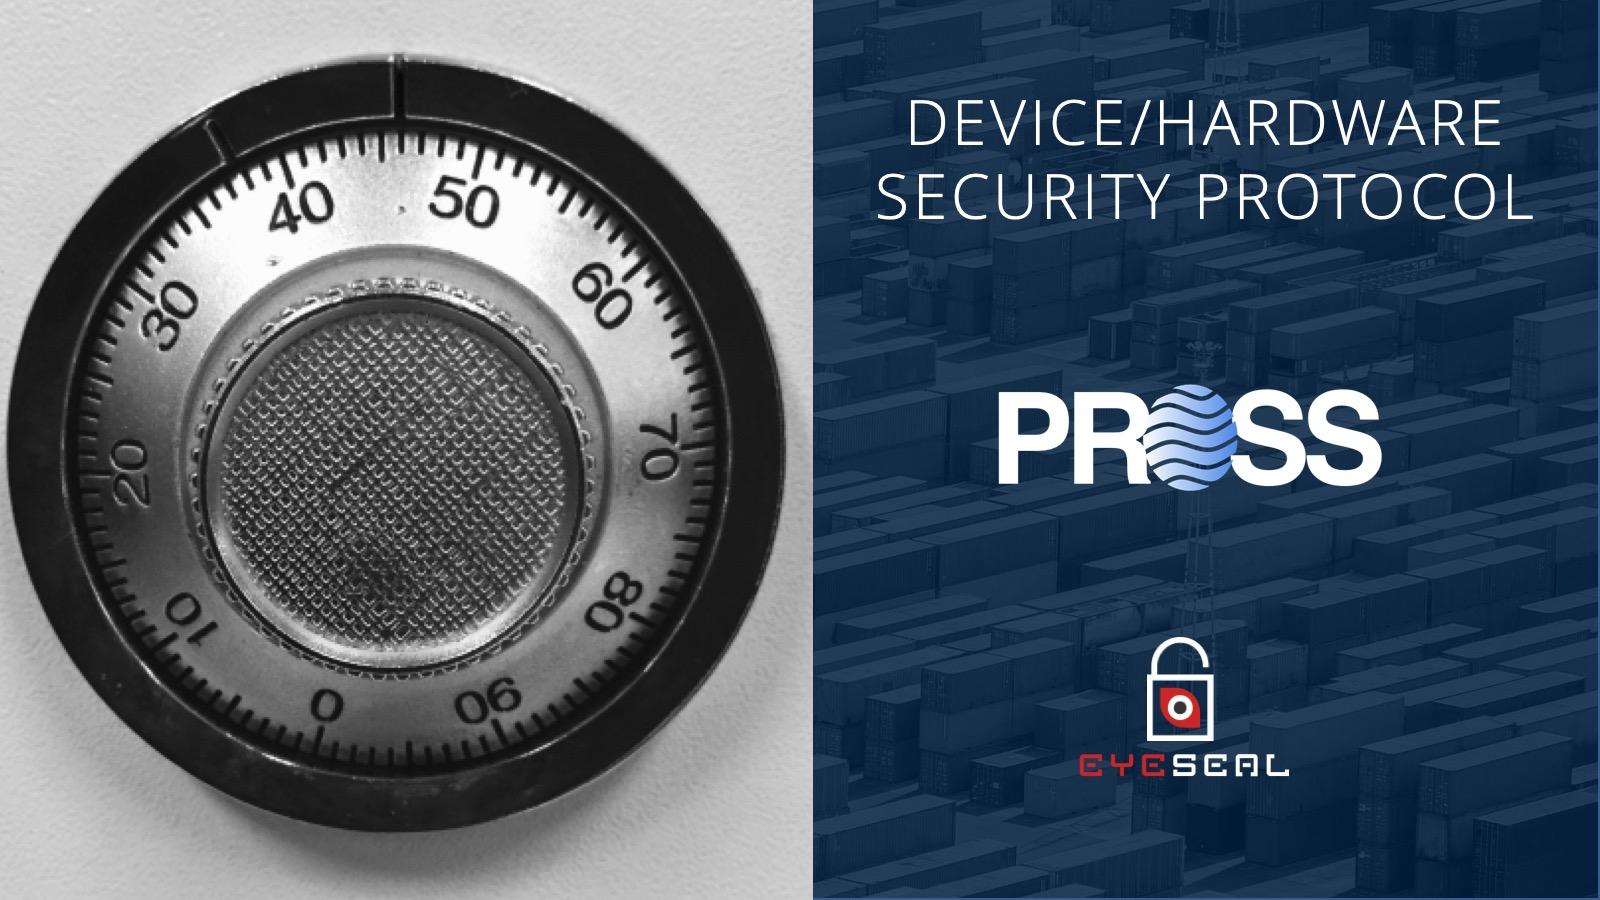 EYESEAL Device Security Protocols.jpg